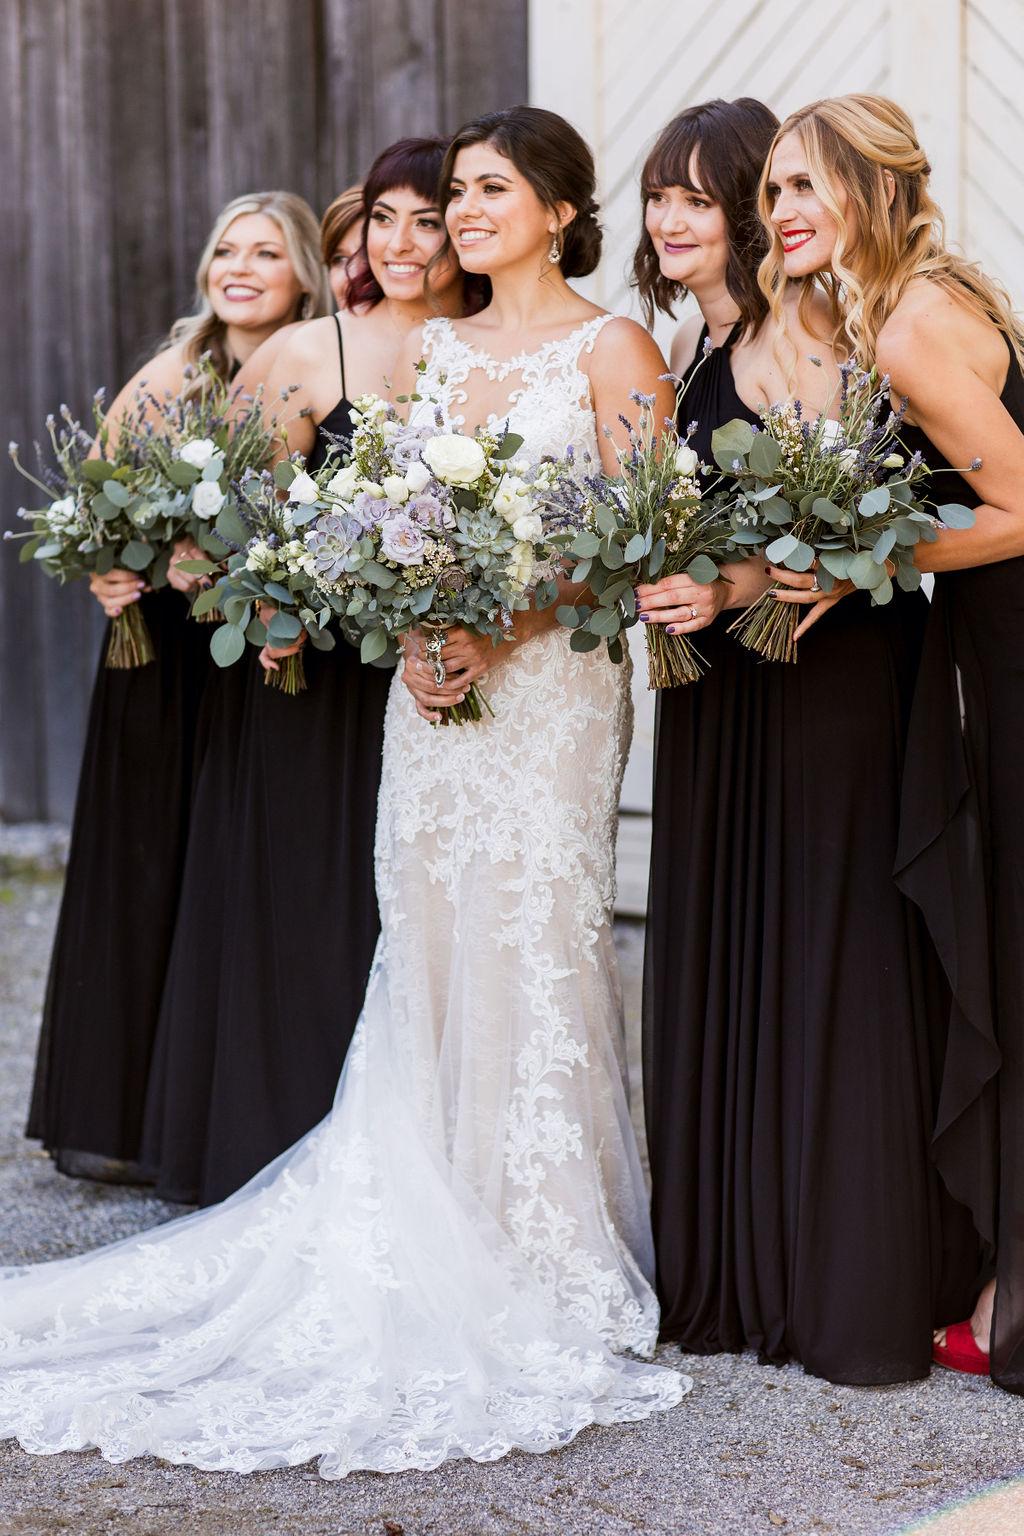 Black bridesmaid dresses   Nashville Bride Guide